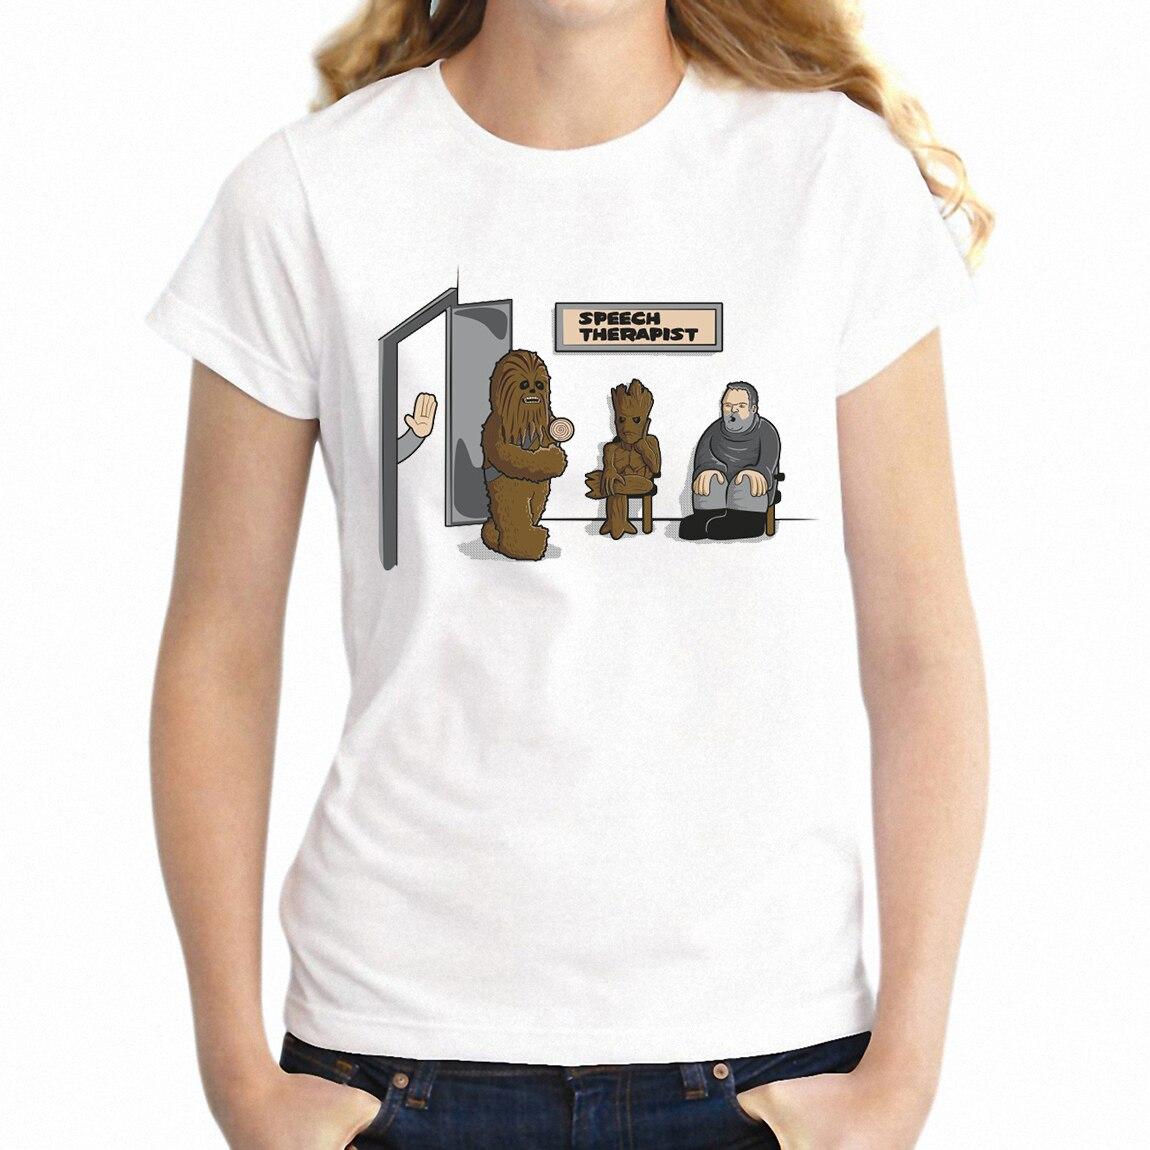 New Women's T-shirt Speech Therapy Chewbacca Chewie Hodor Groot Funny Girl's tshirt Harajuku Streetwear tees tops(China)